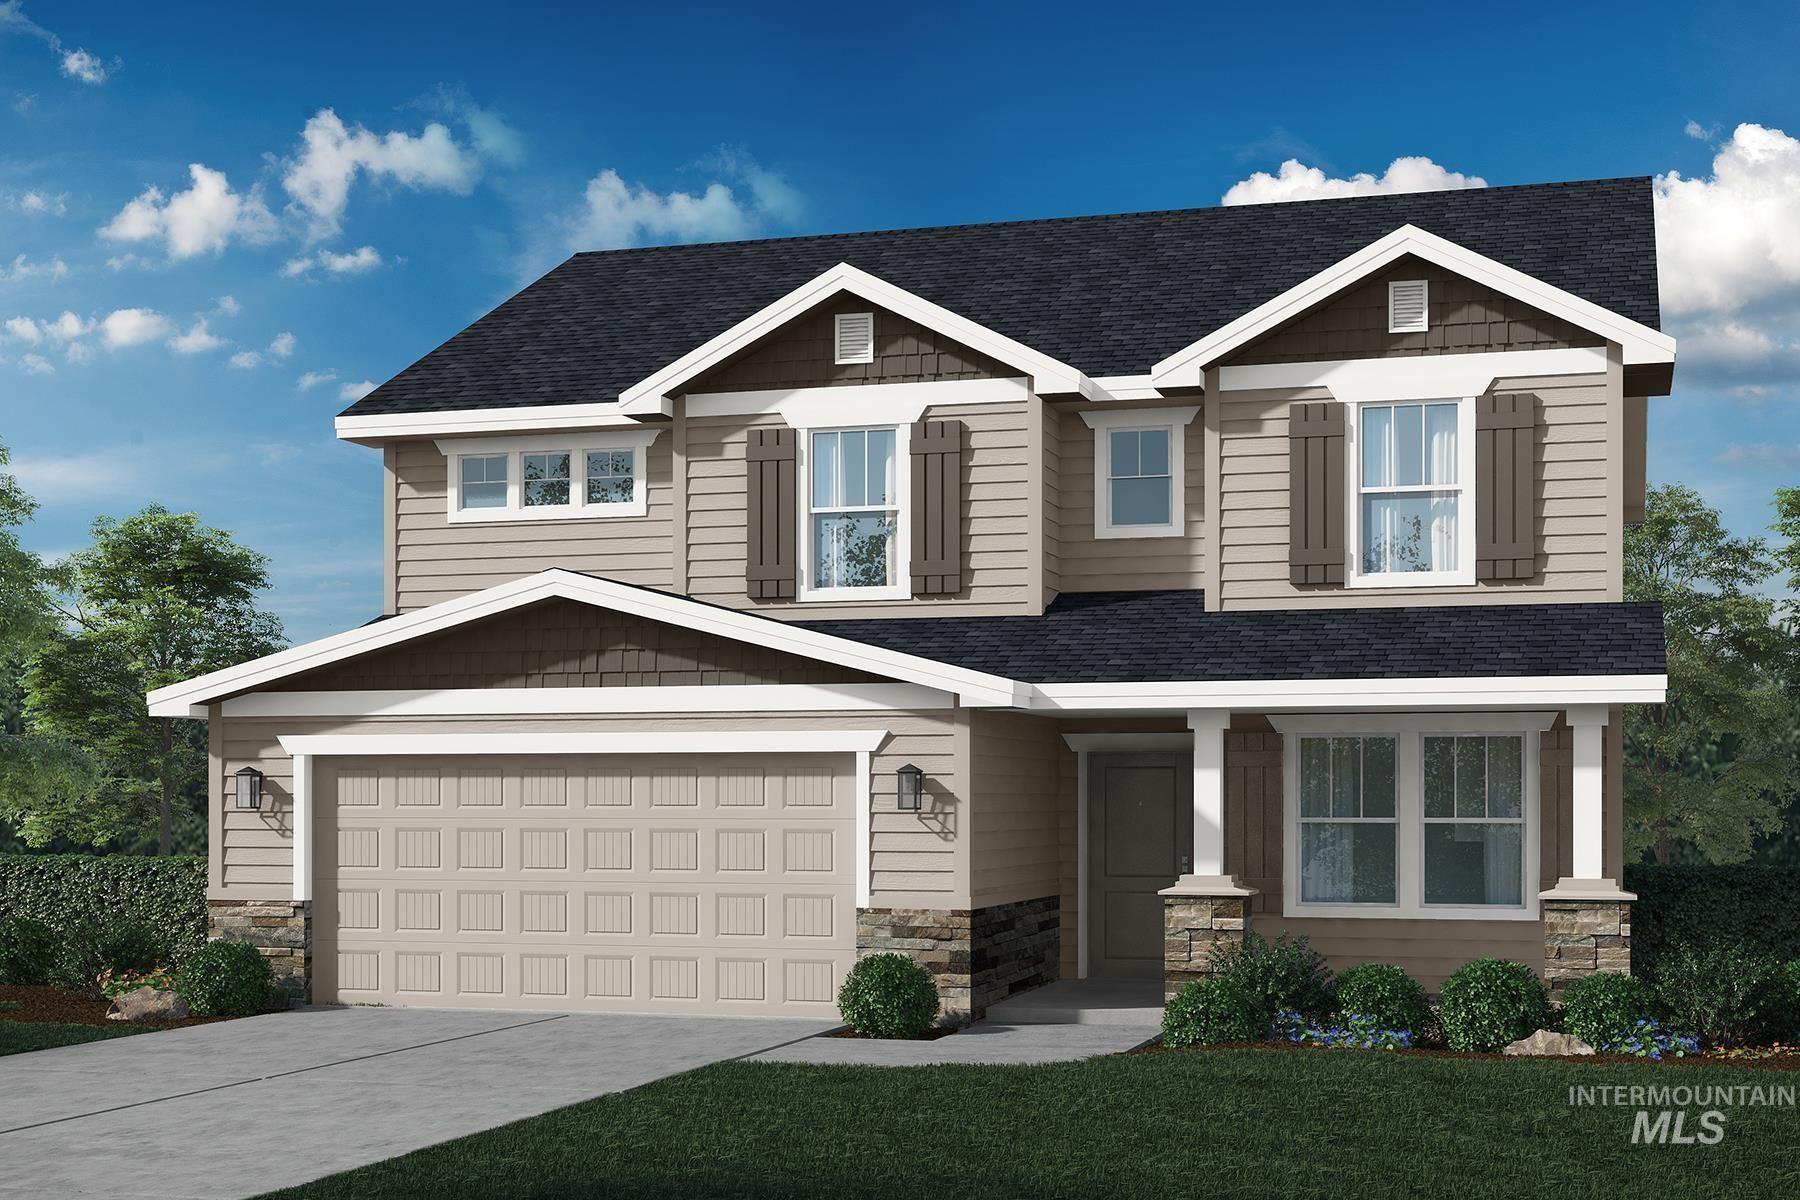 735 SW Raelynn St., Mountain Home, ID 83647 - MLS#: 98816000